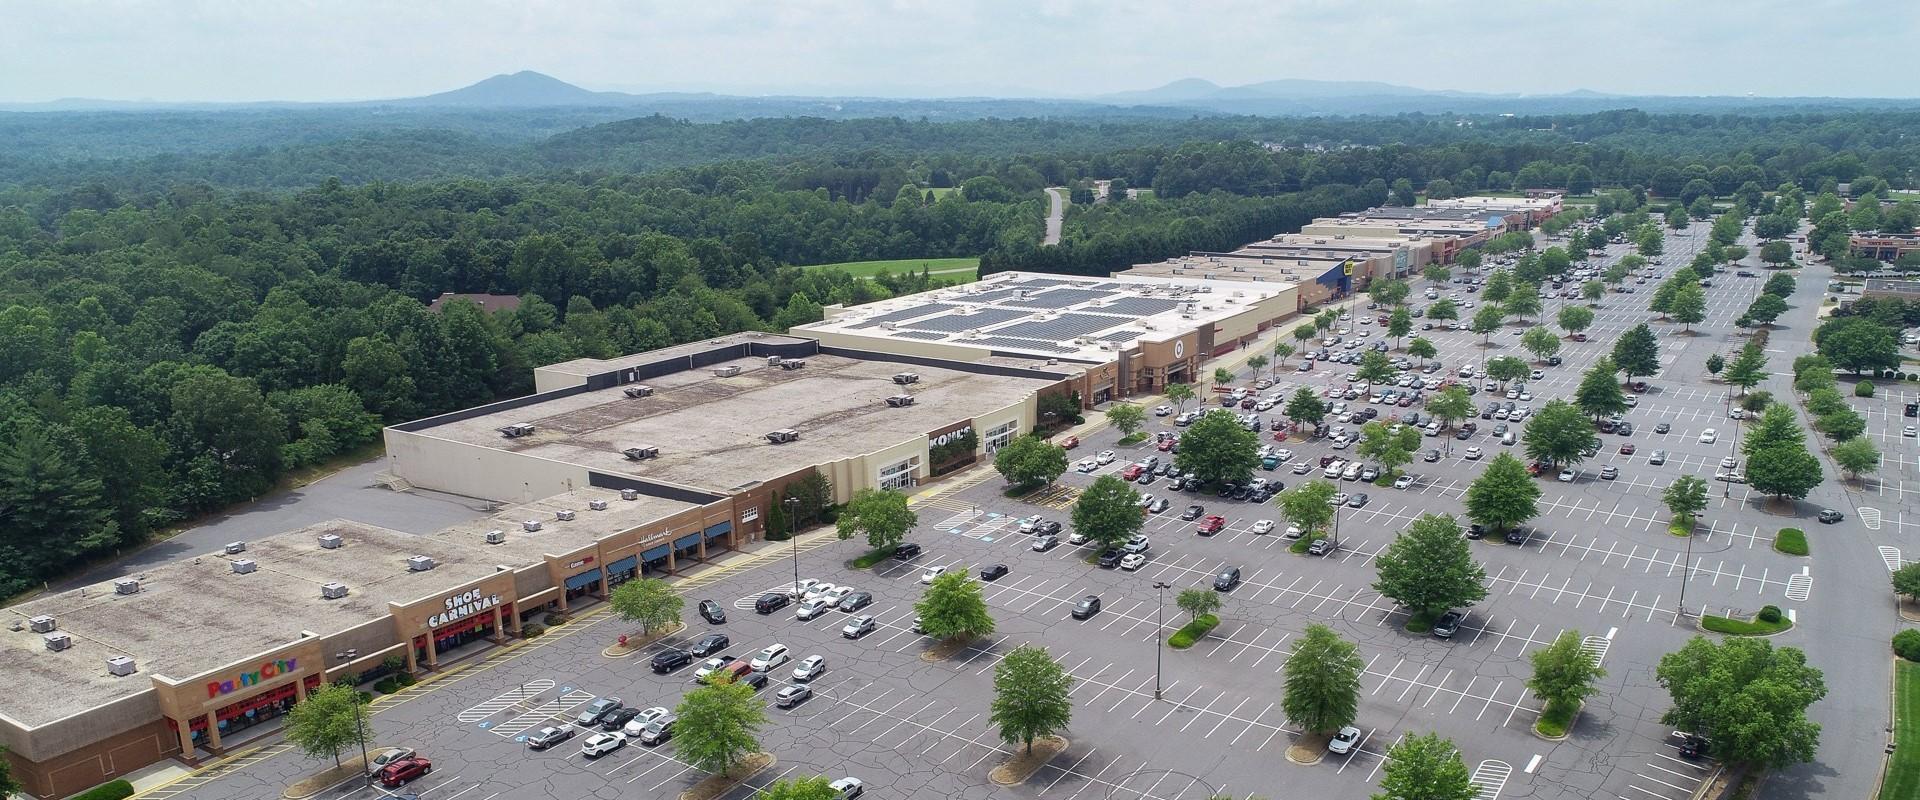 Target Shopping Center